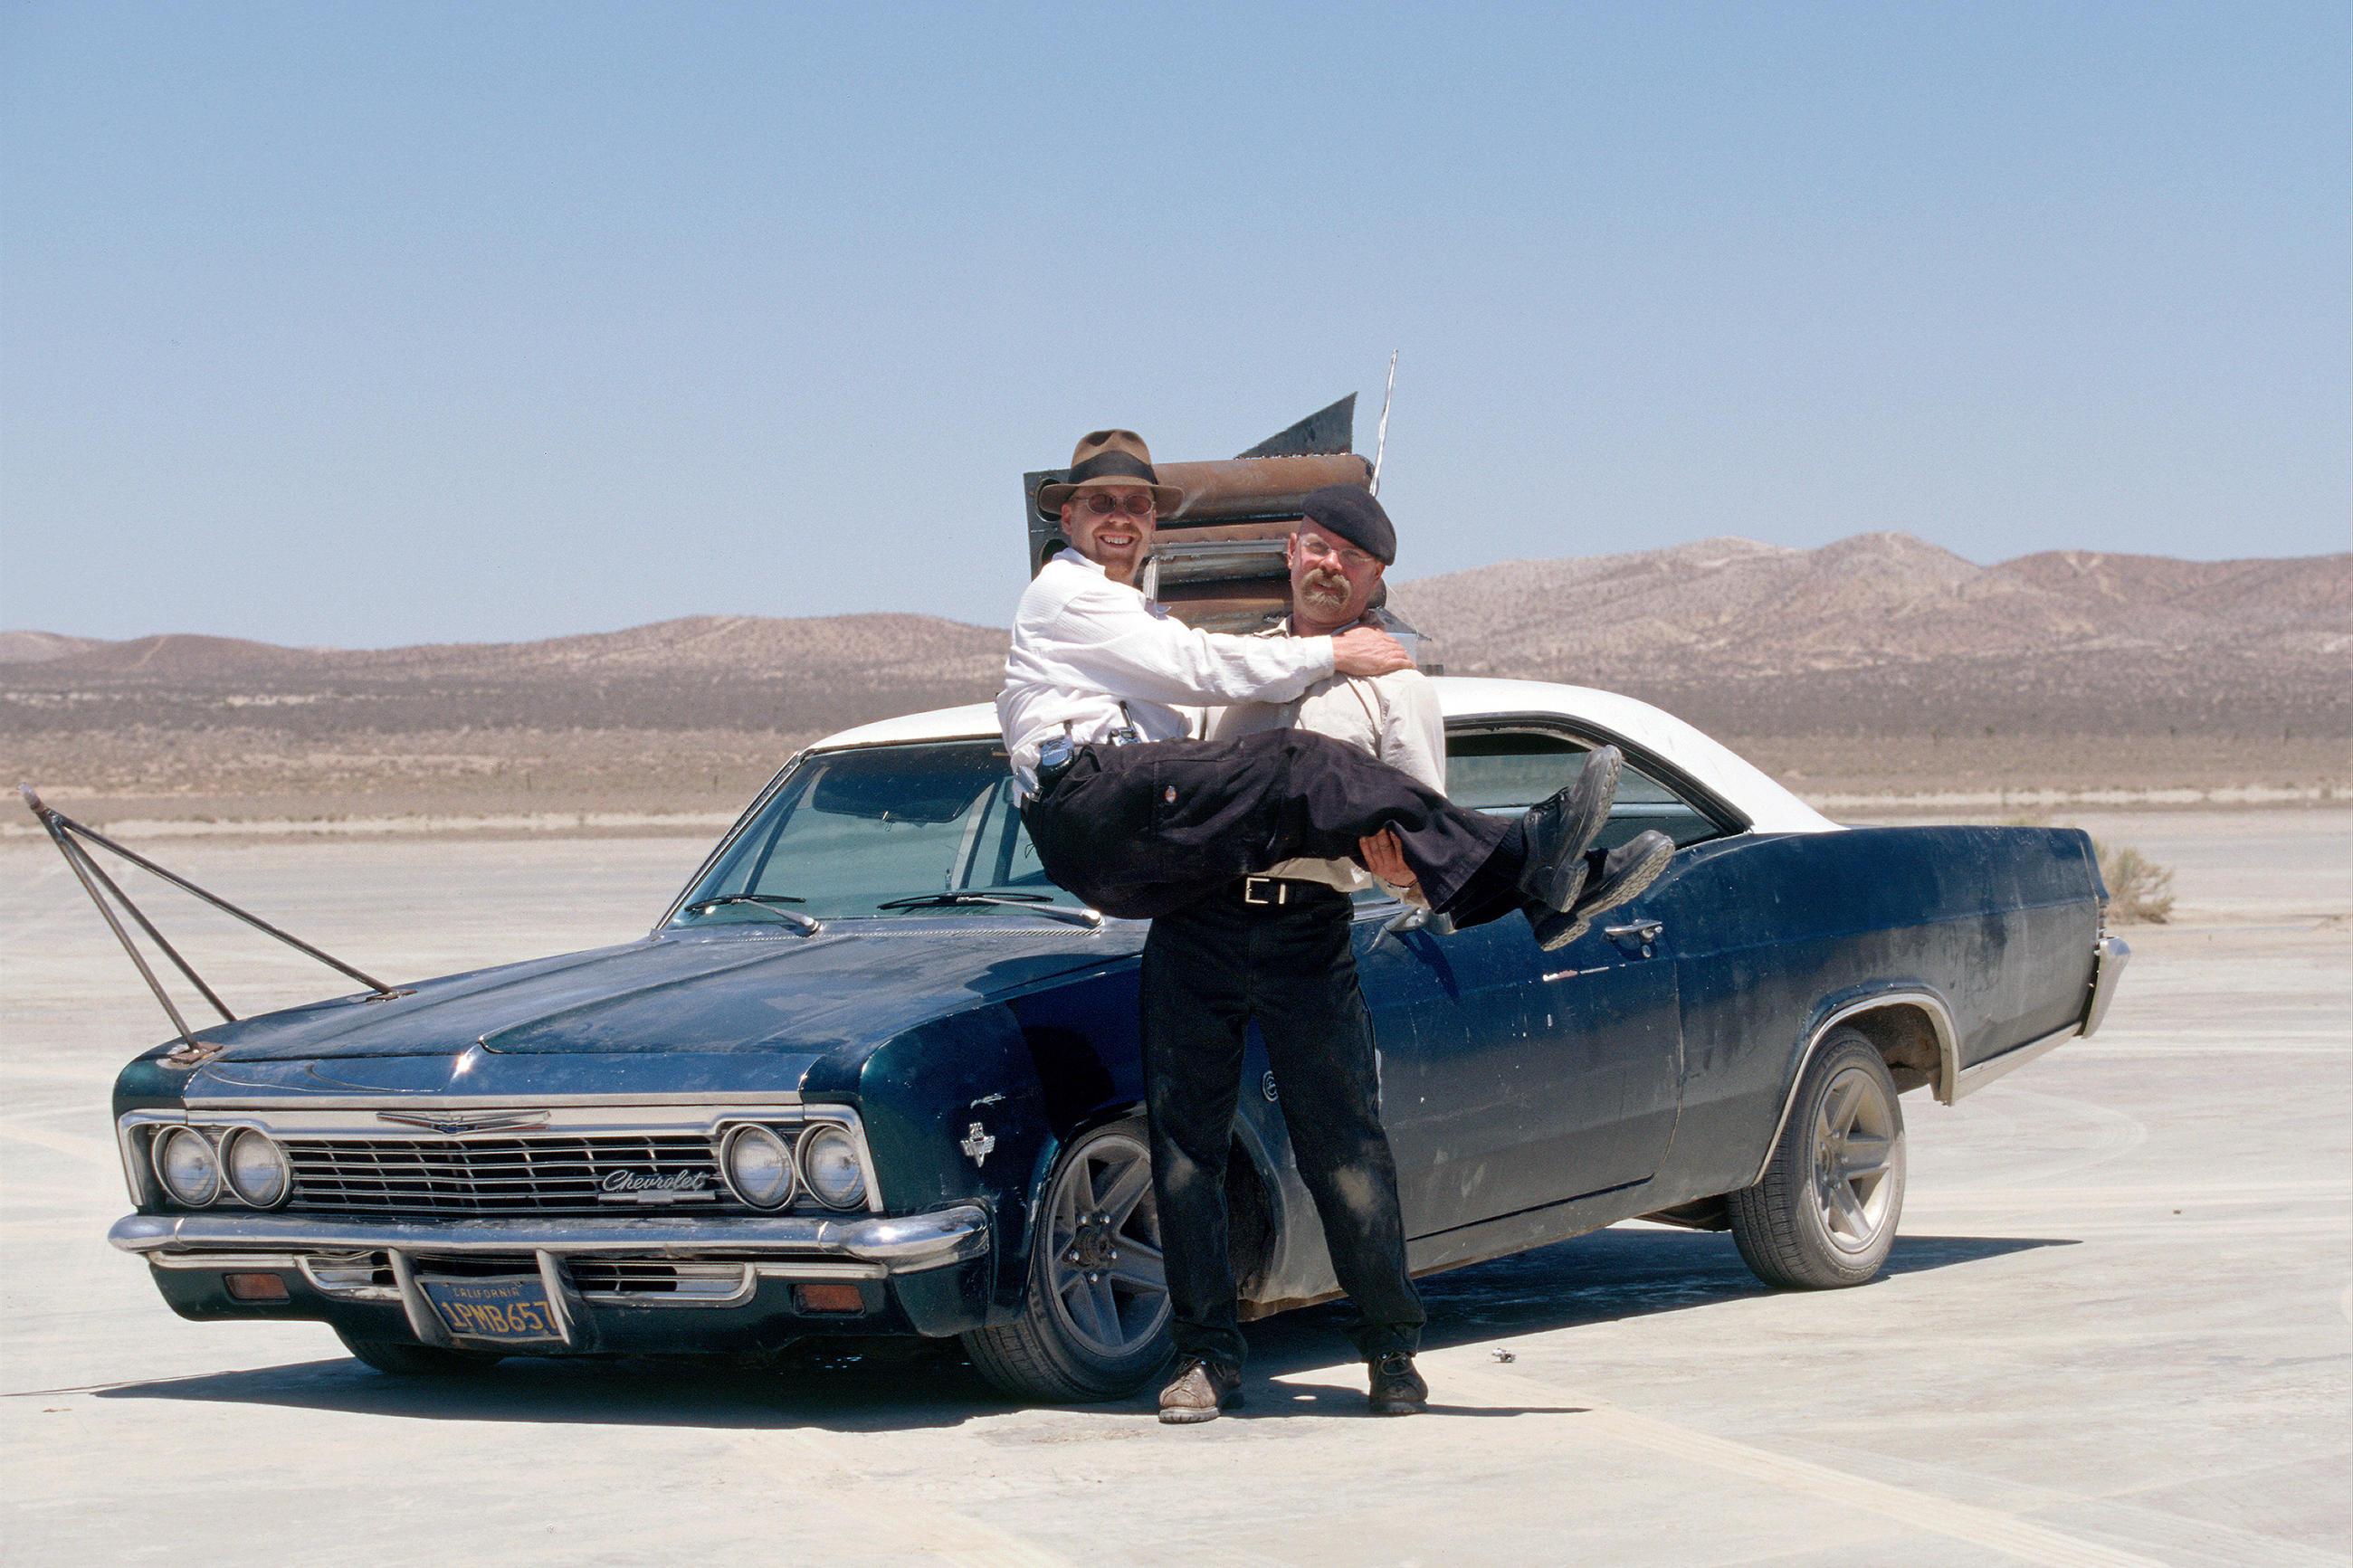 Rocket Car (2003)